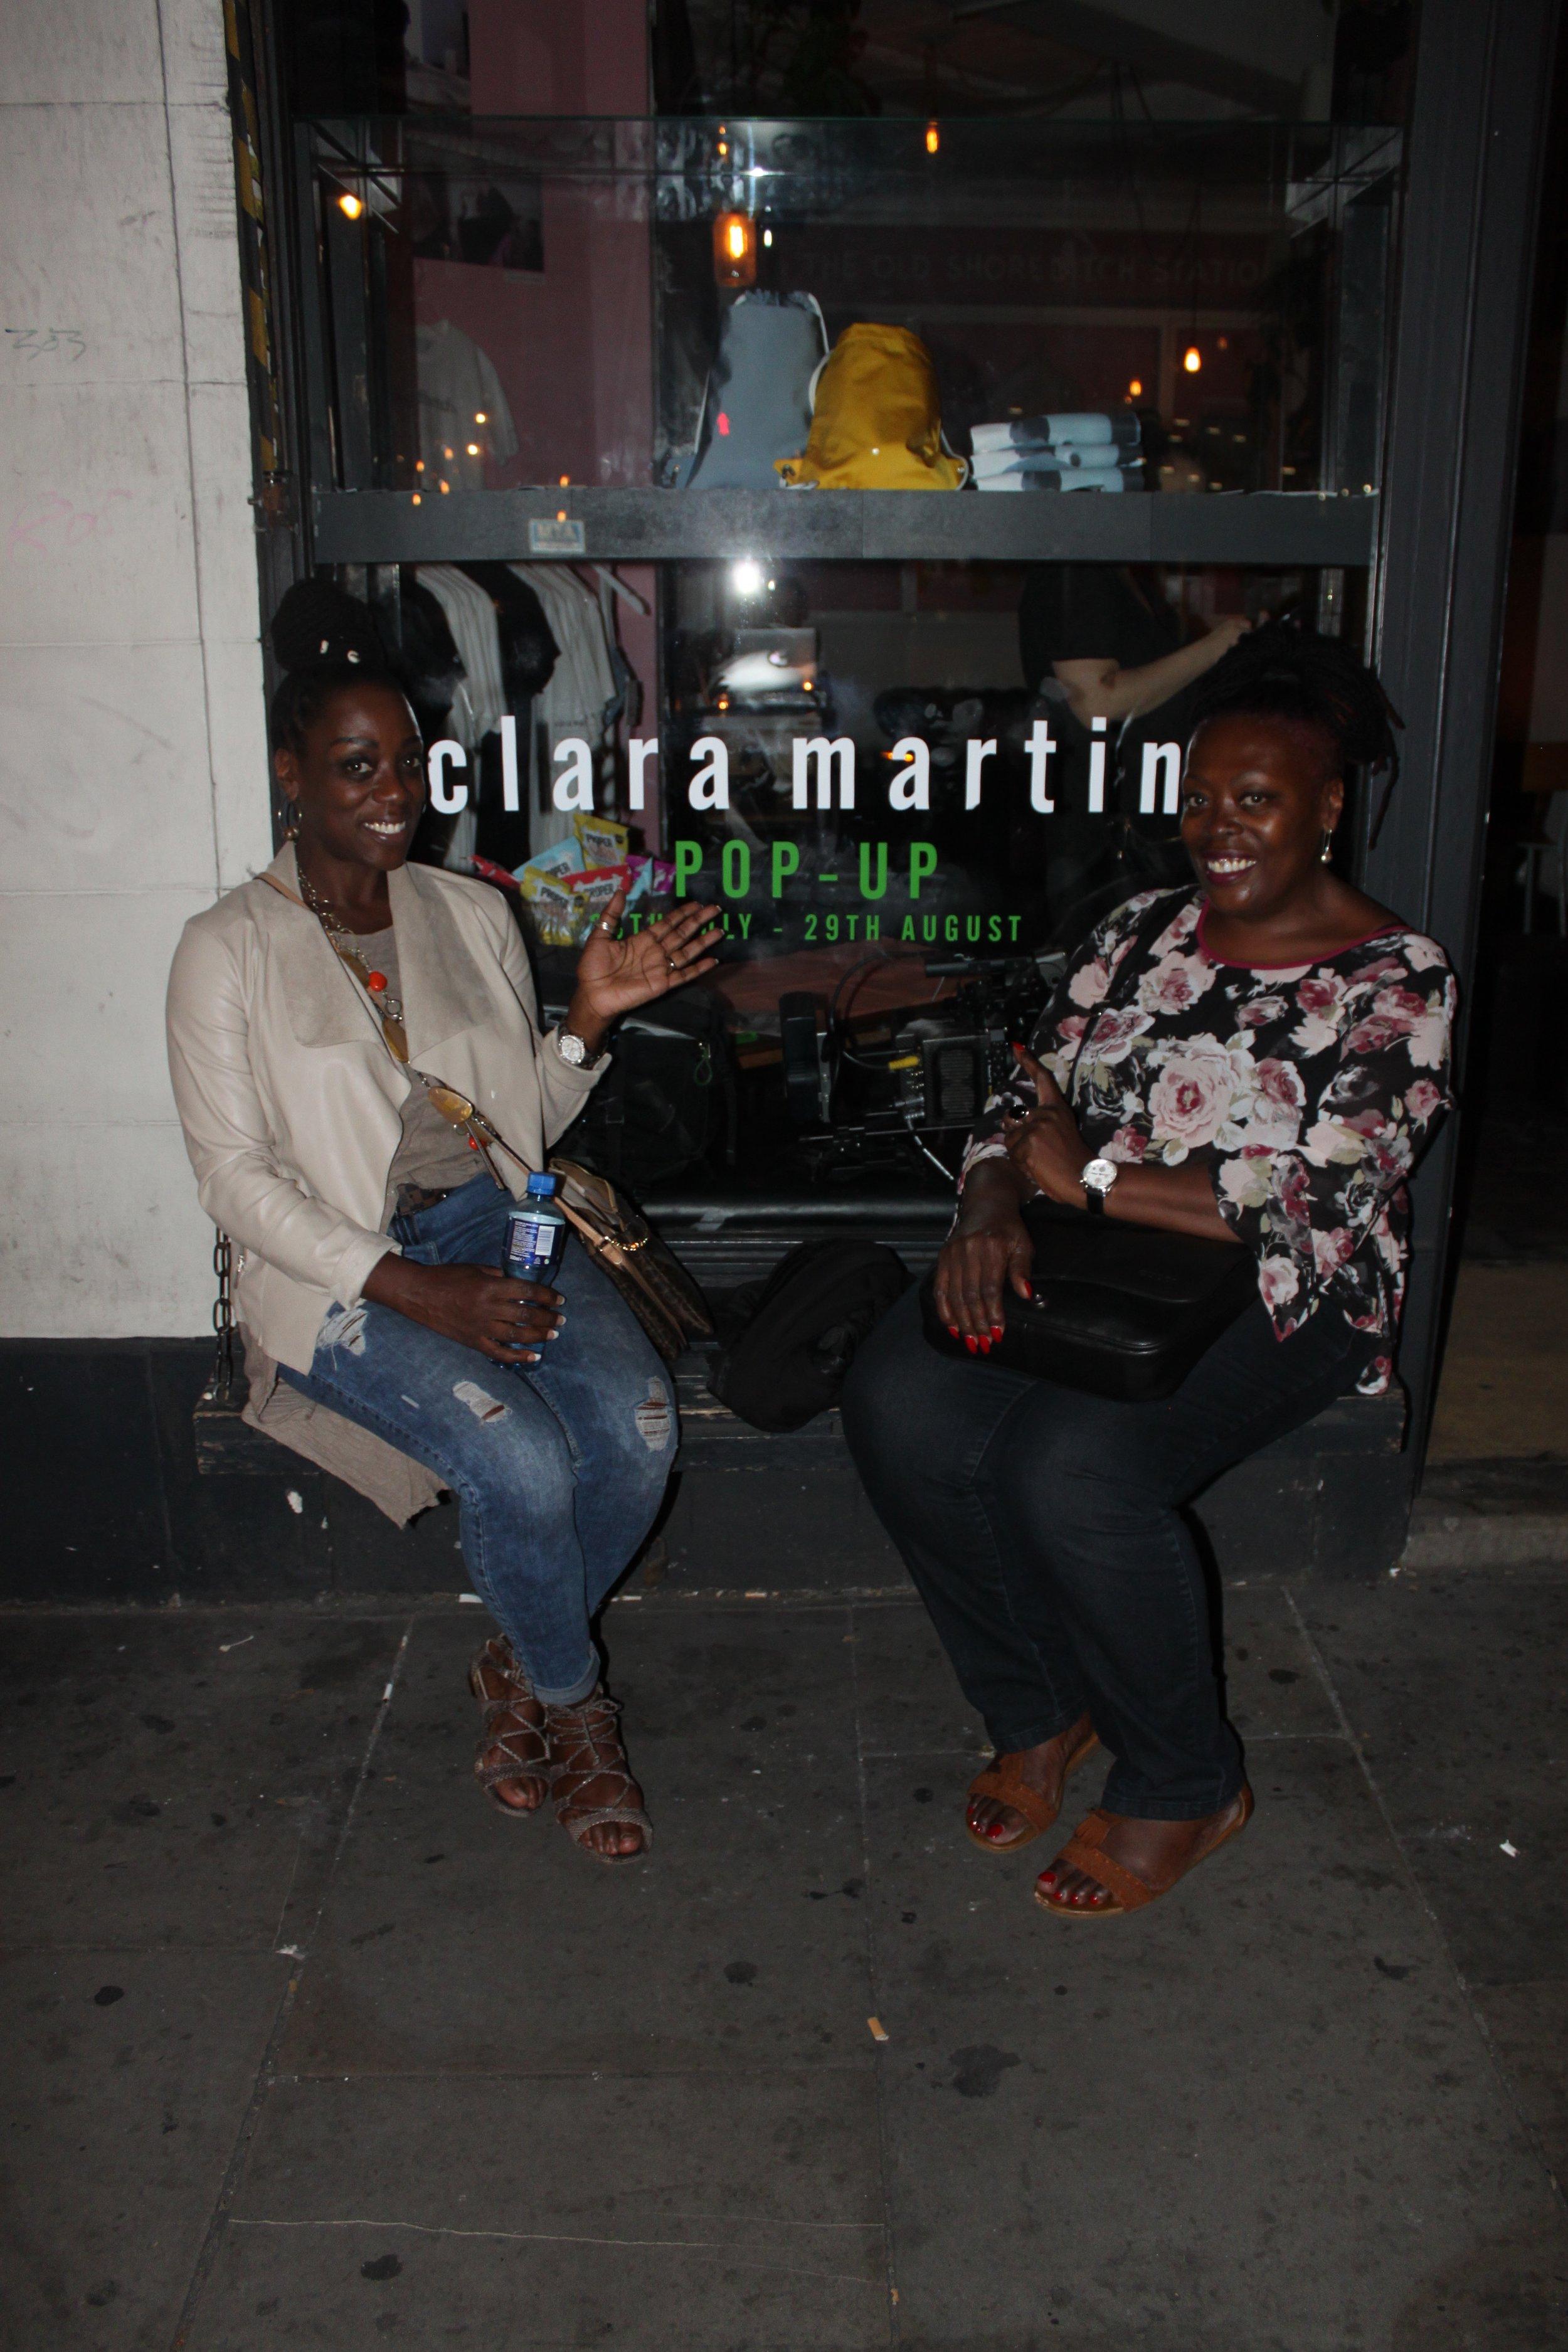 clara-martin-pop-up-shop-menswear-front